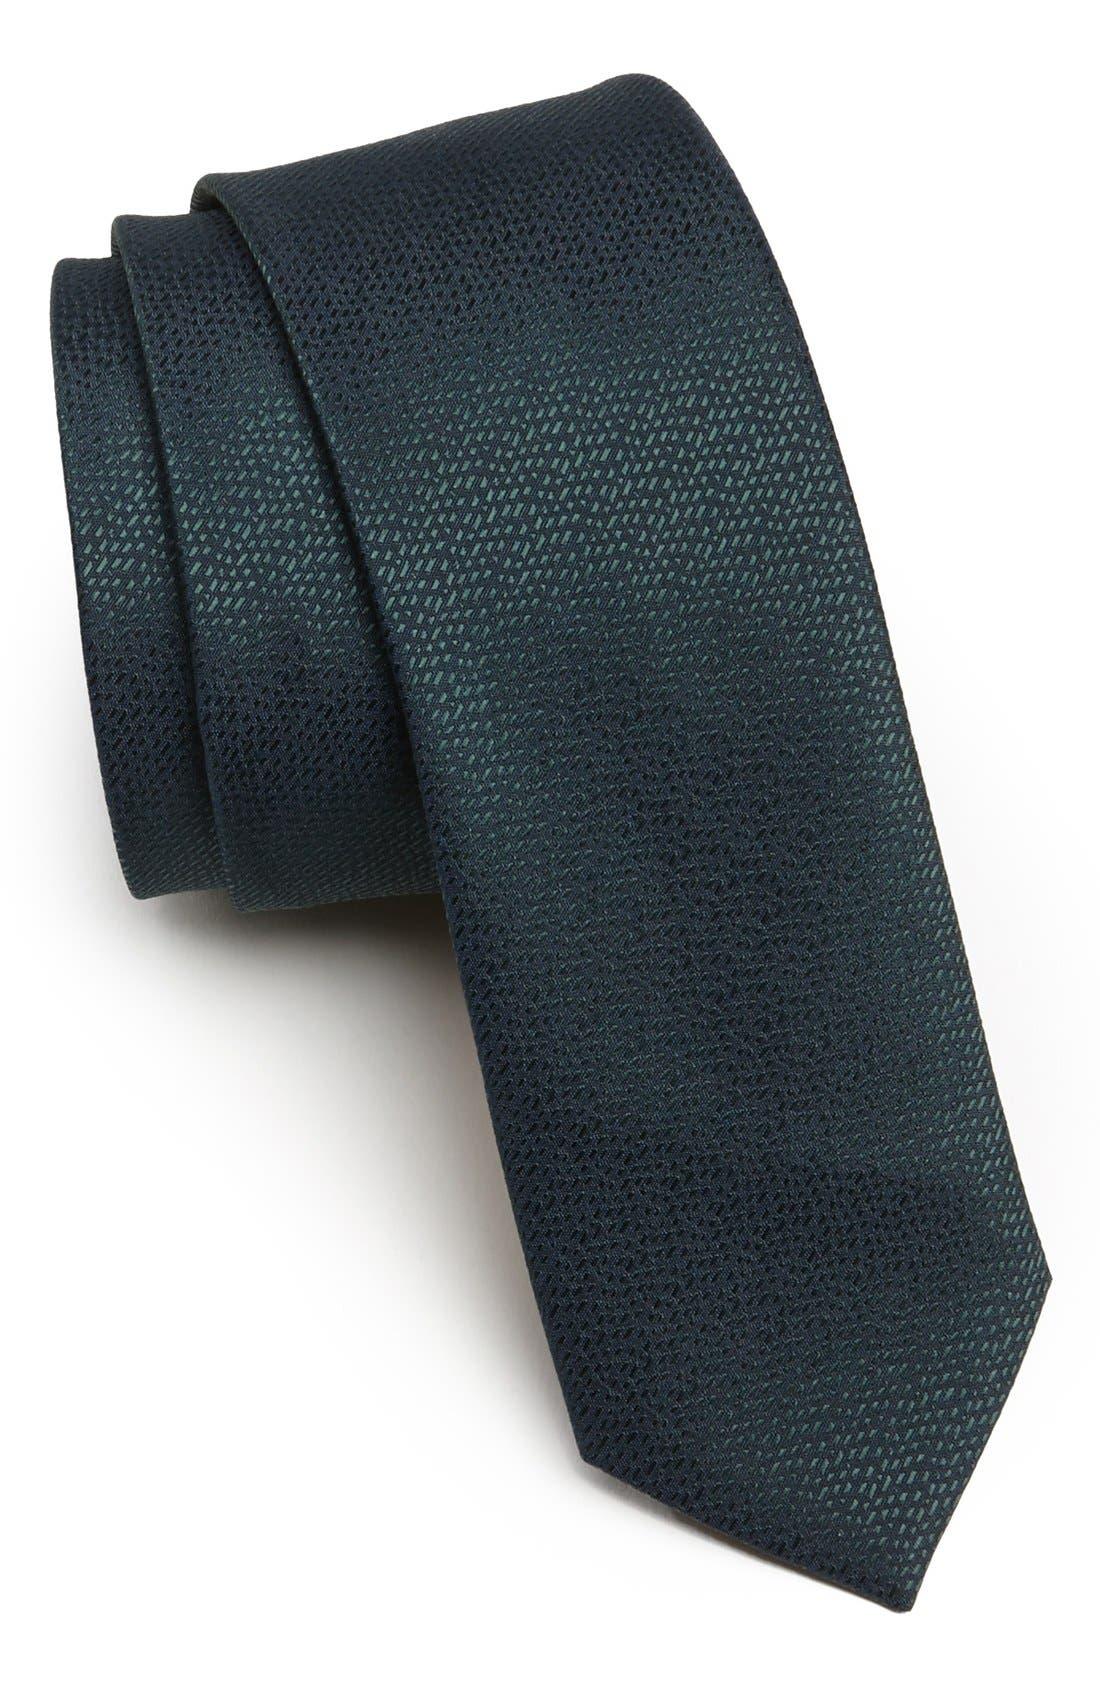 Alternate Image 1 Selected - Topman Textured Woven Tie